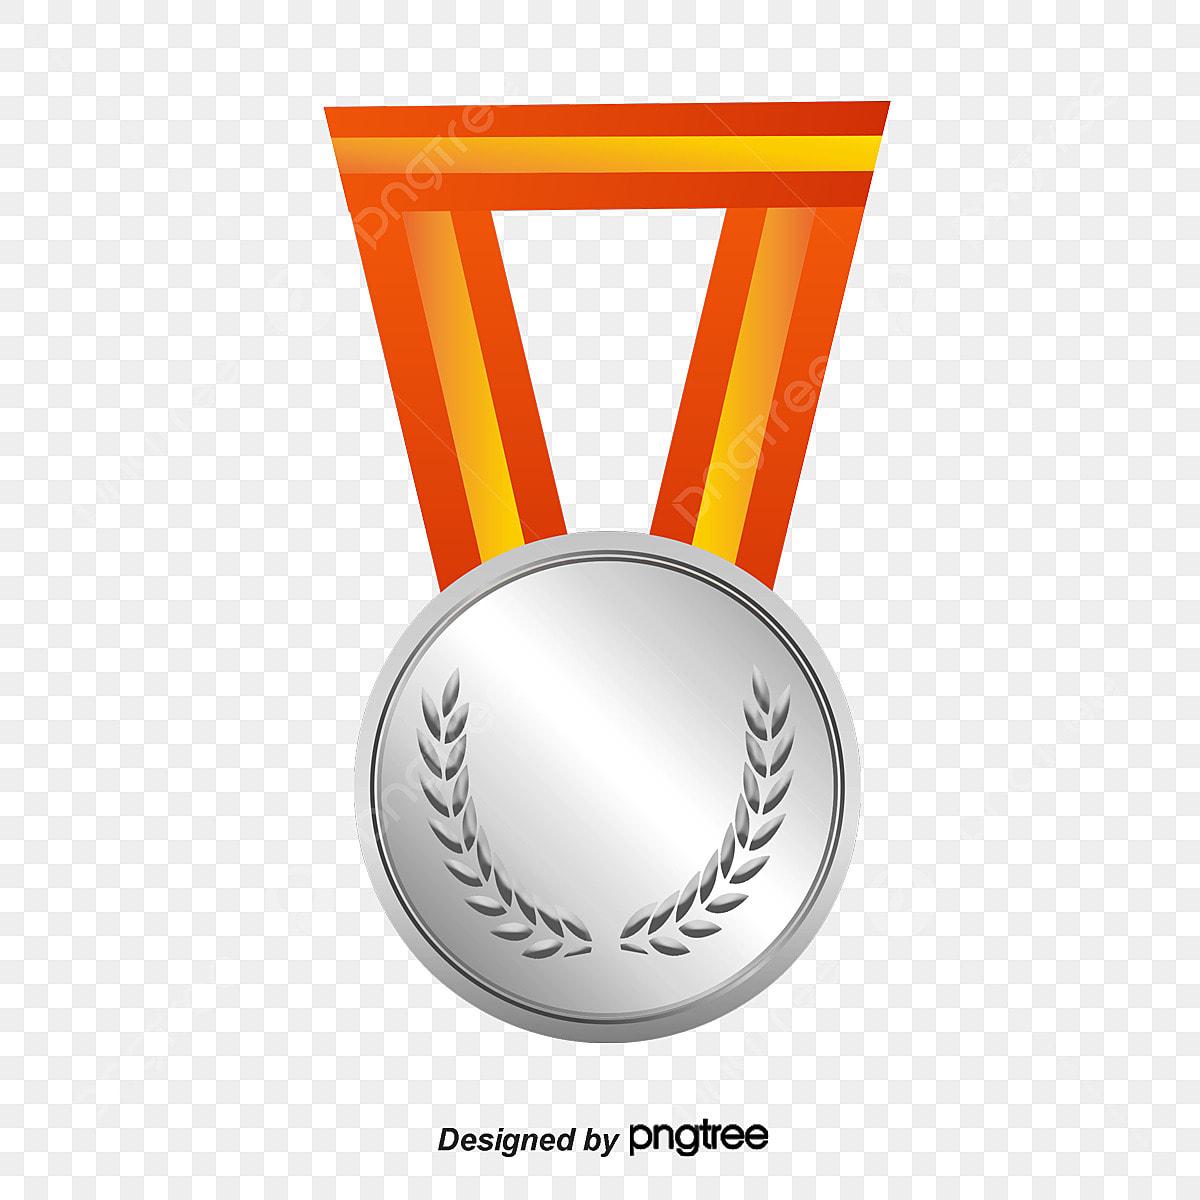 silver medal - Clip Art Library